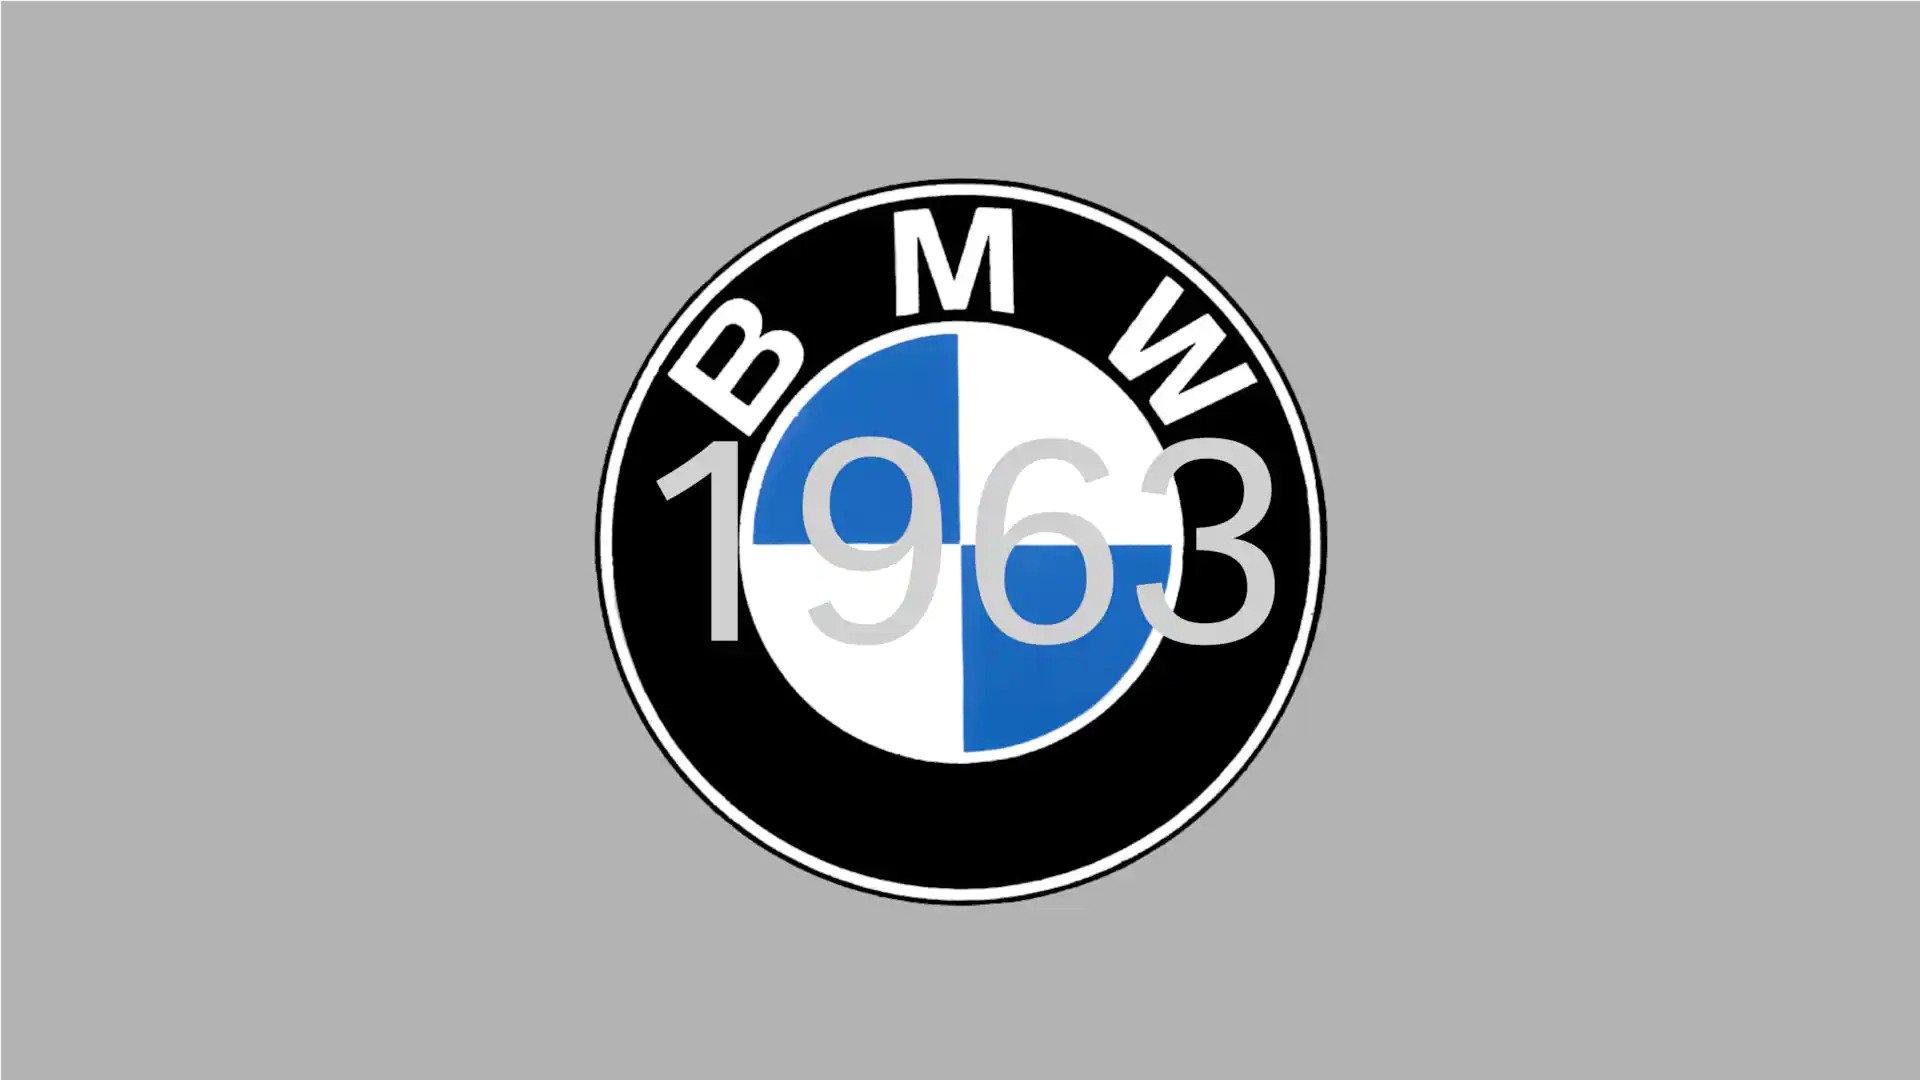 BMW 1963 logo